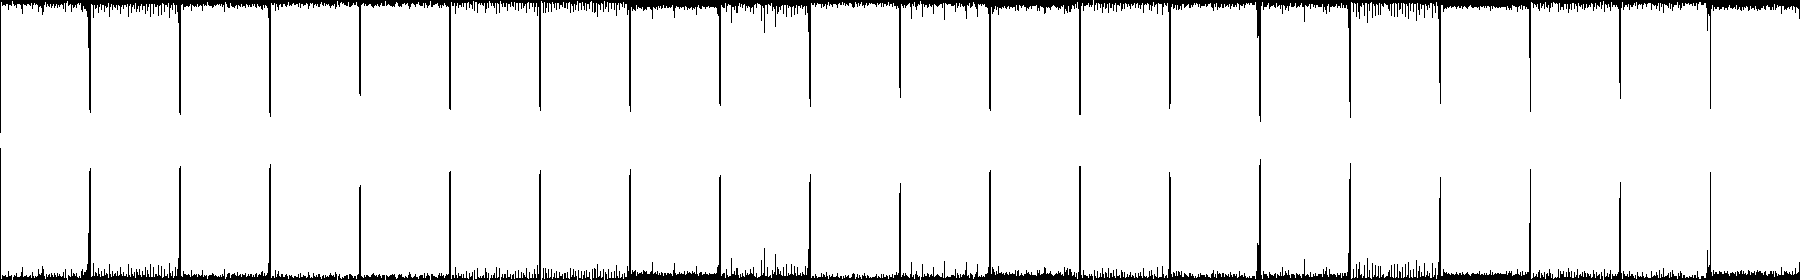 PSY Trance Legacy audio waveform